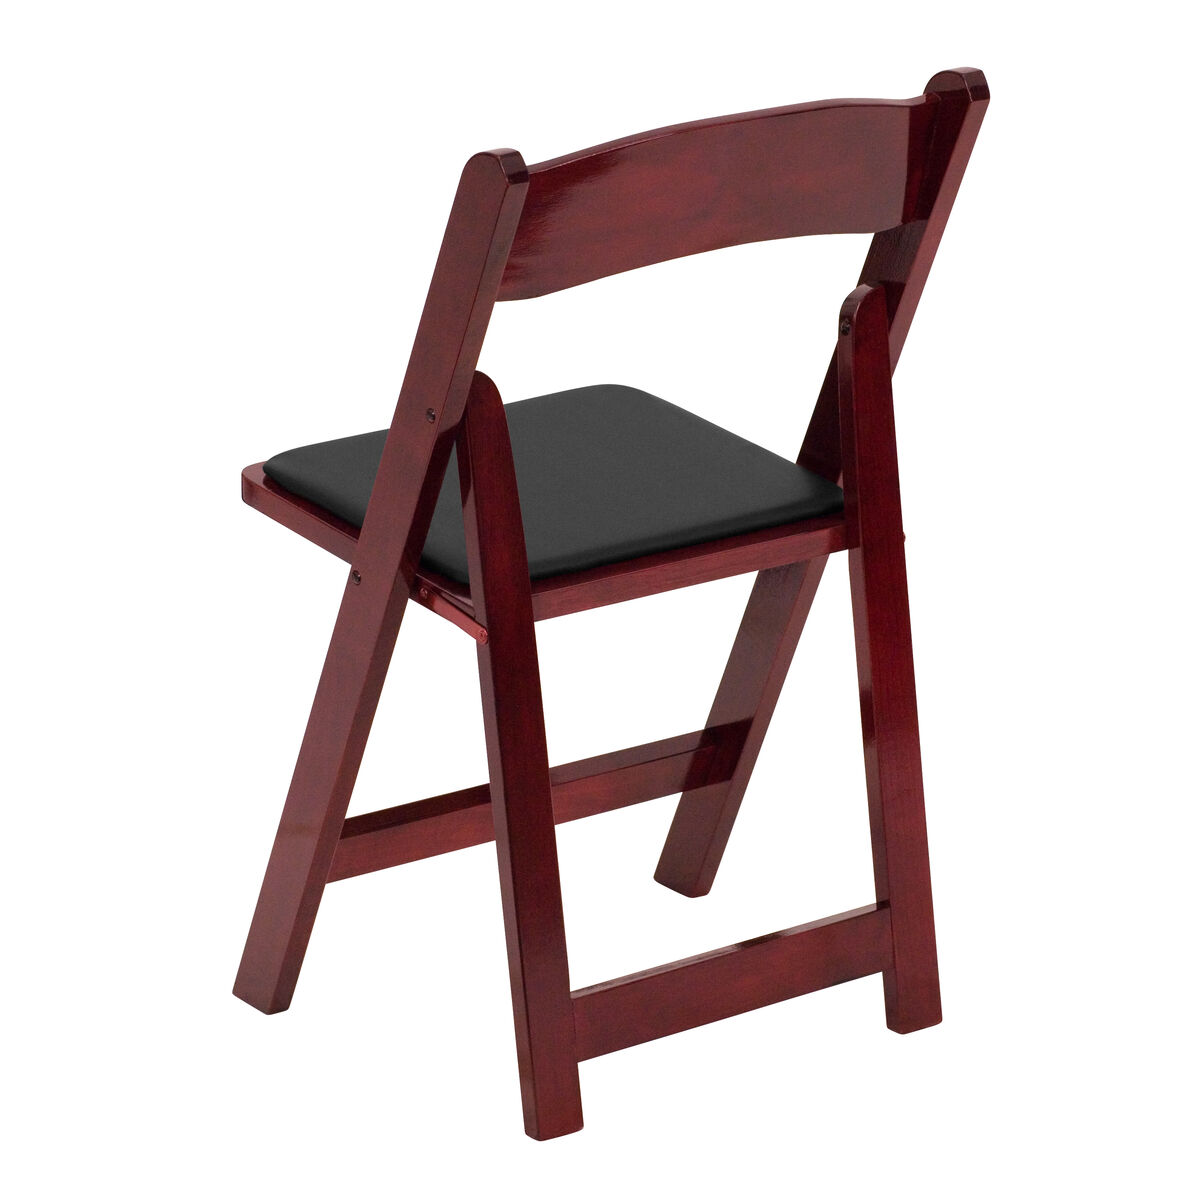 Mahogany Wood Folding Chair Xf 2903 Mah Wood Gg